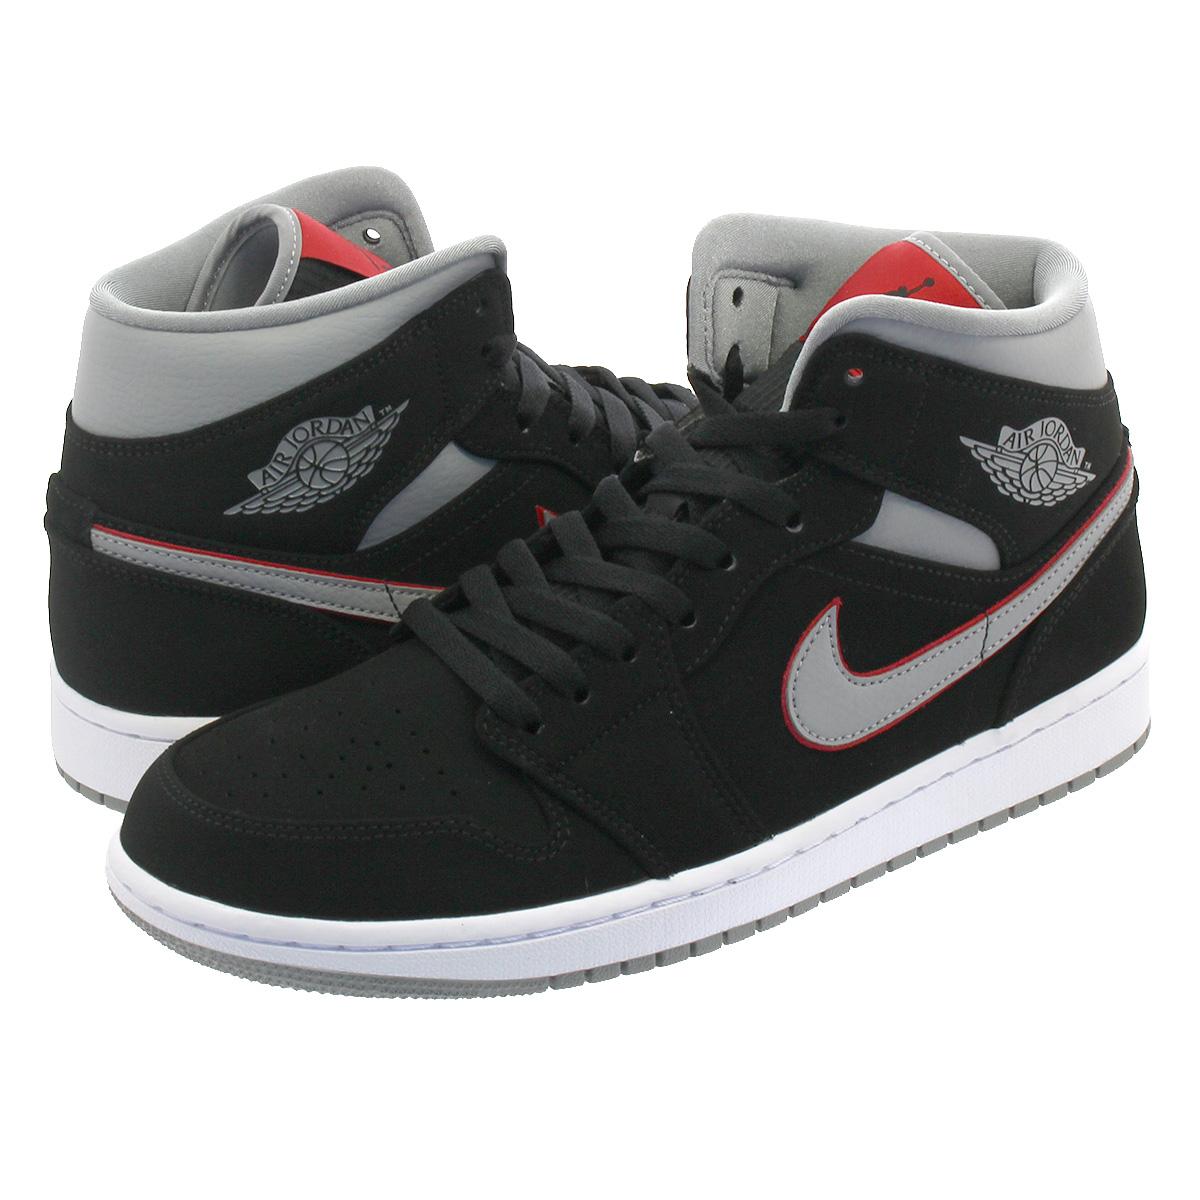 size 40 5ad57 a5e04 NIKE AIR JORDAN 1 MID Nike Air Jordan 1 mid BLACK/PARTICLE GREY/WHITE/GYM  RED 554,724-060